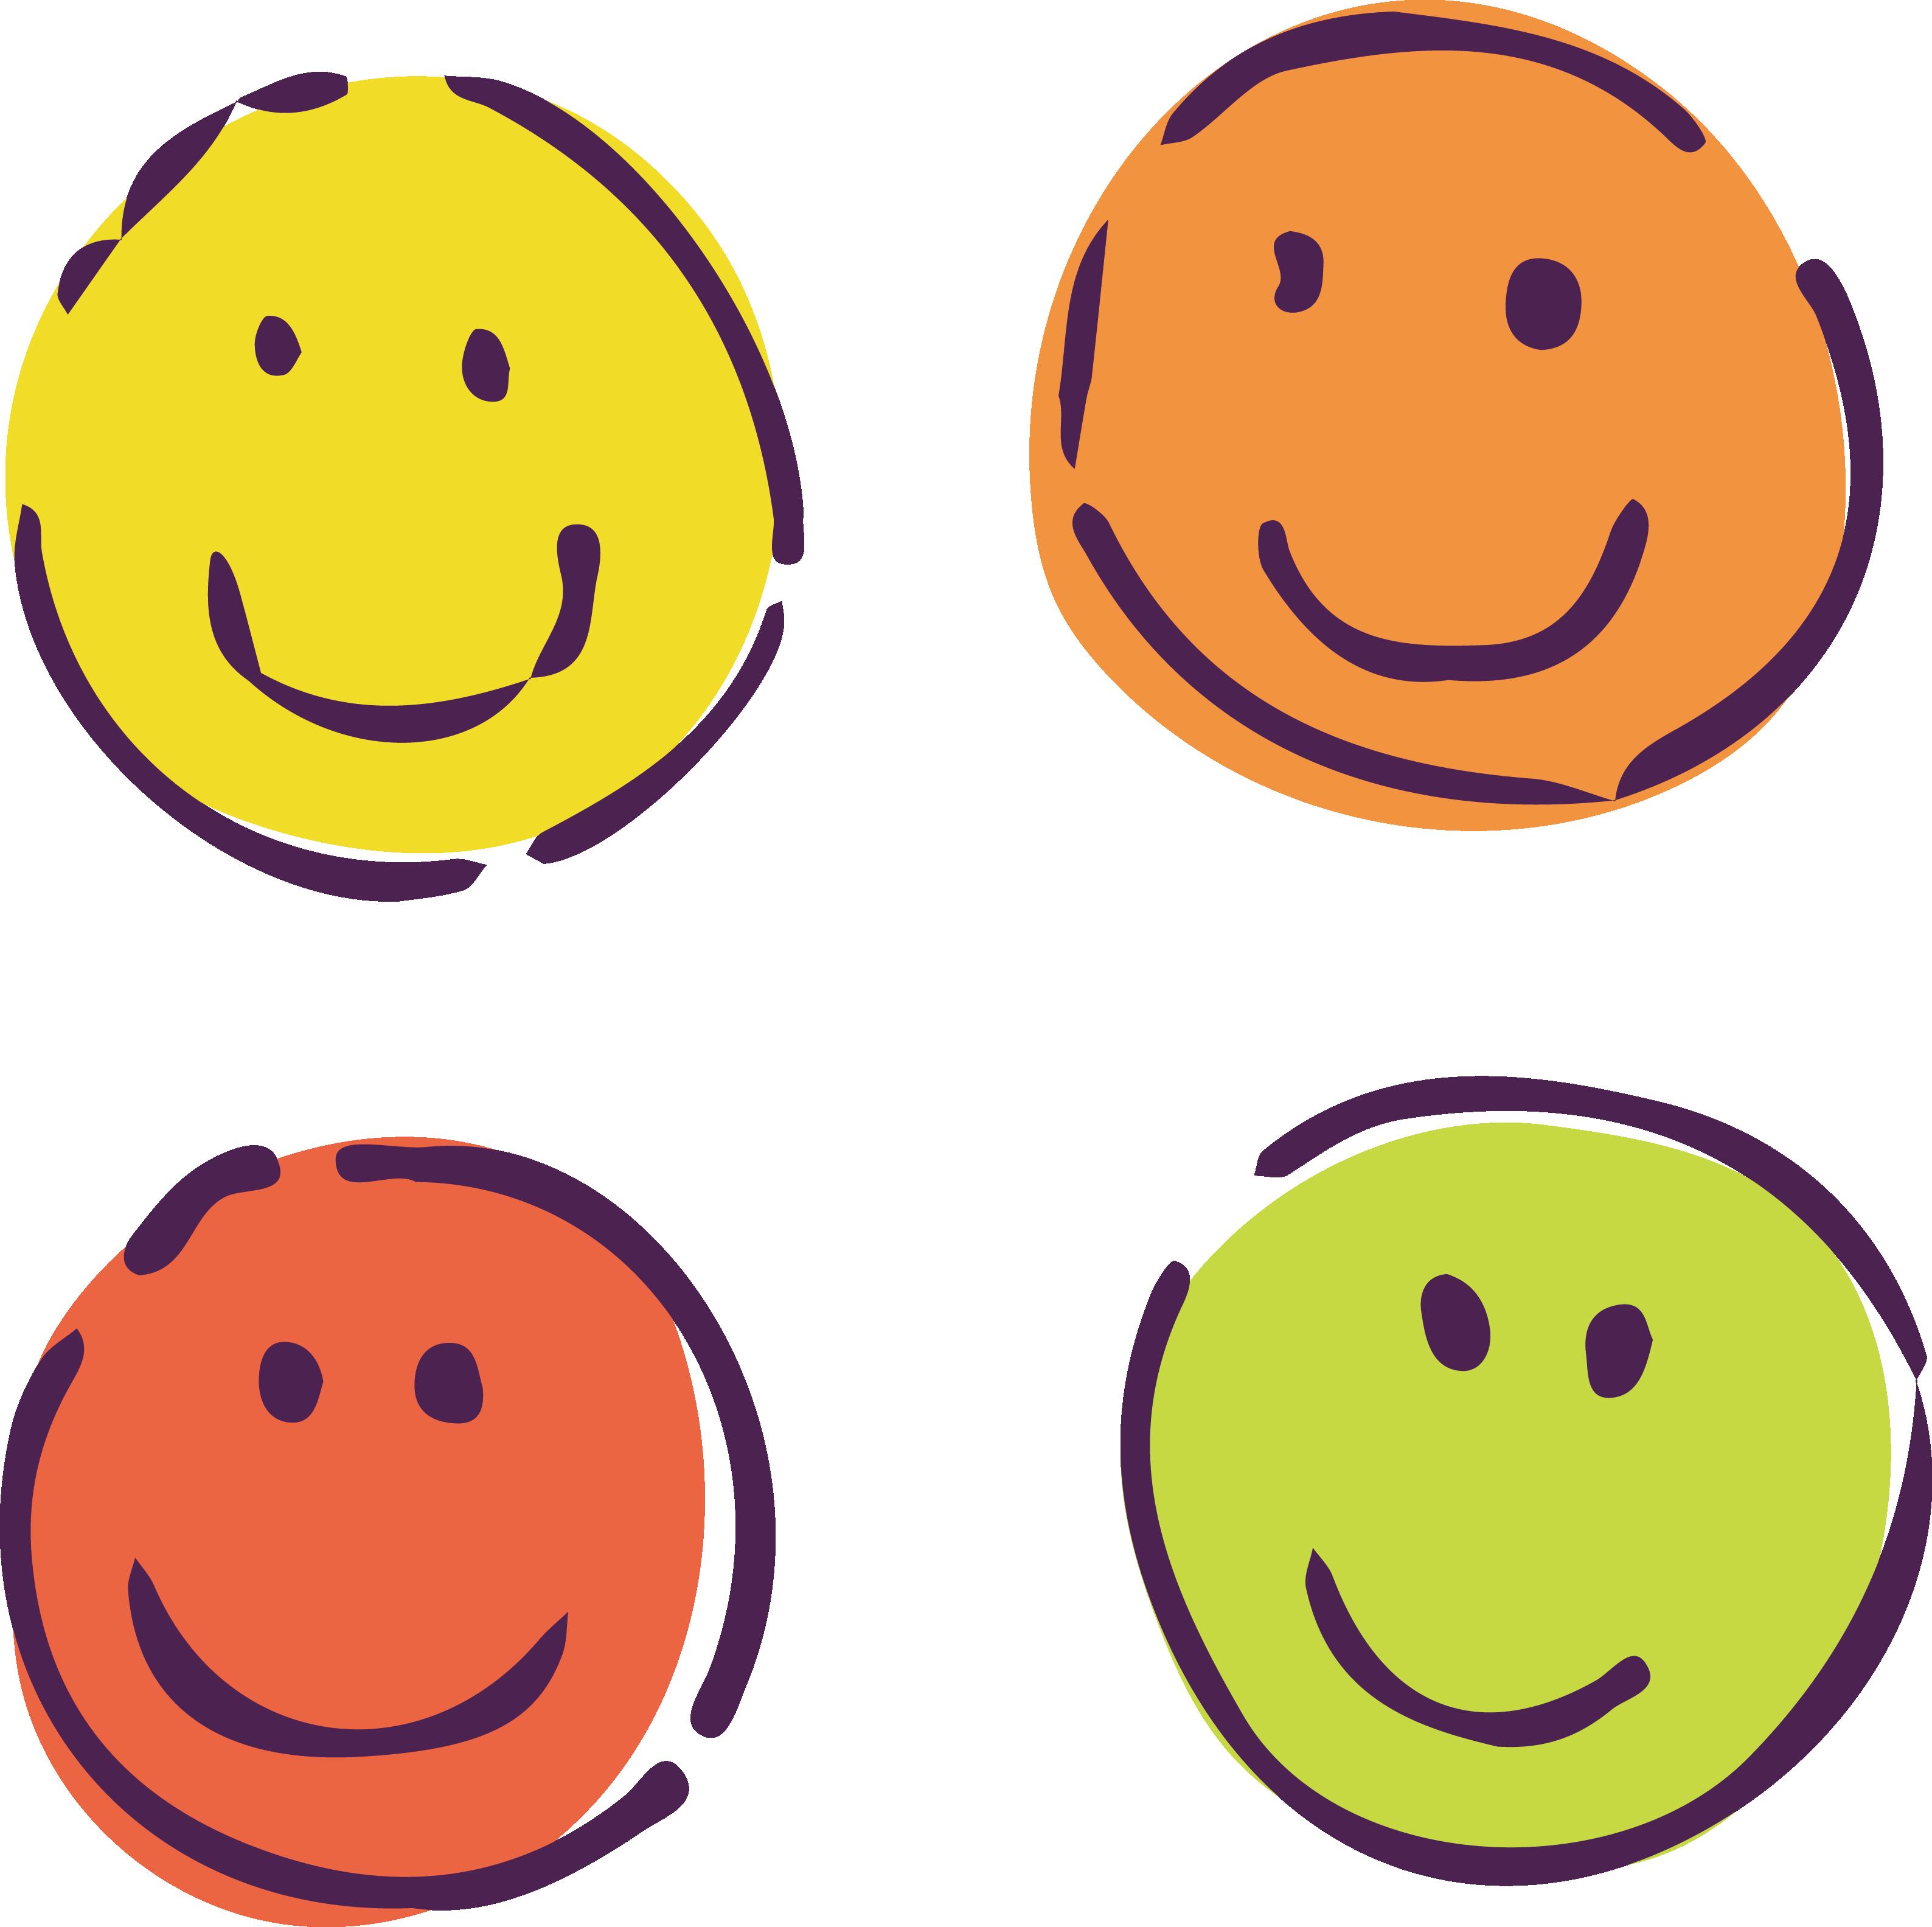 Emotions clipart four basic. Smiley cartoon clip art